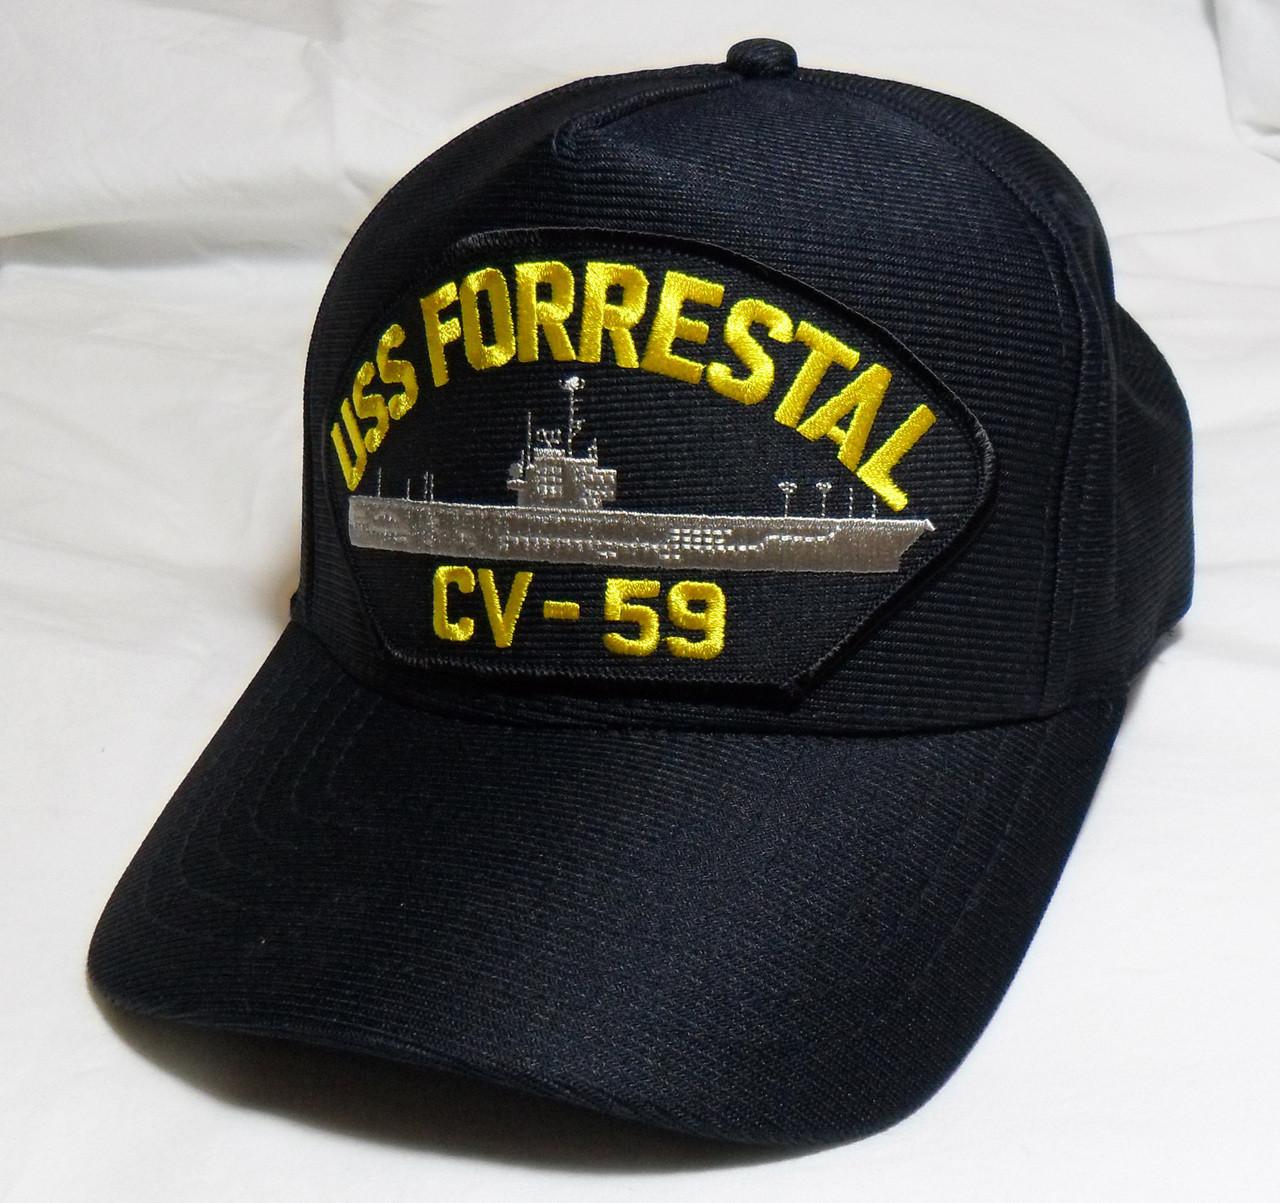 USS FORRESTAL CV-59 US NAVY SHIP HAT OFFICIALLY LICENSED Baseball Cap Made  in USA 043605b1666